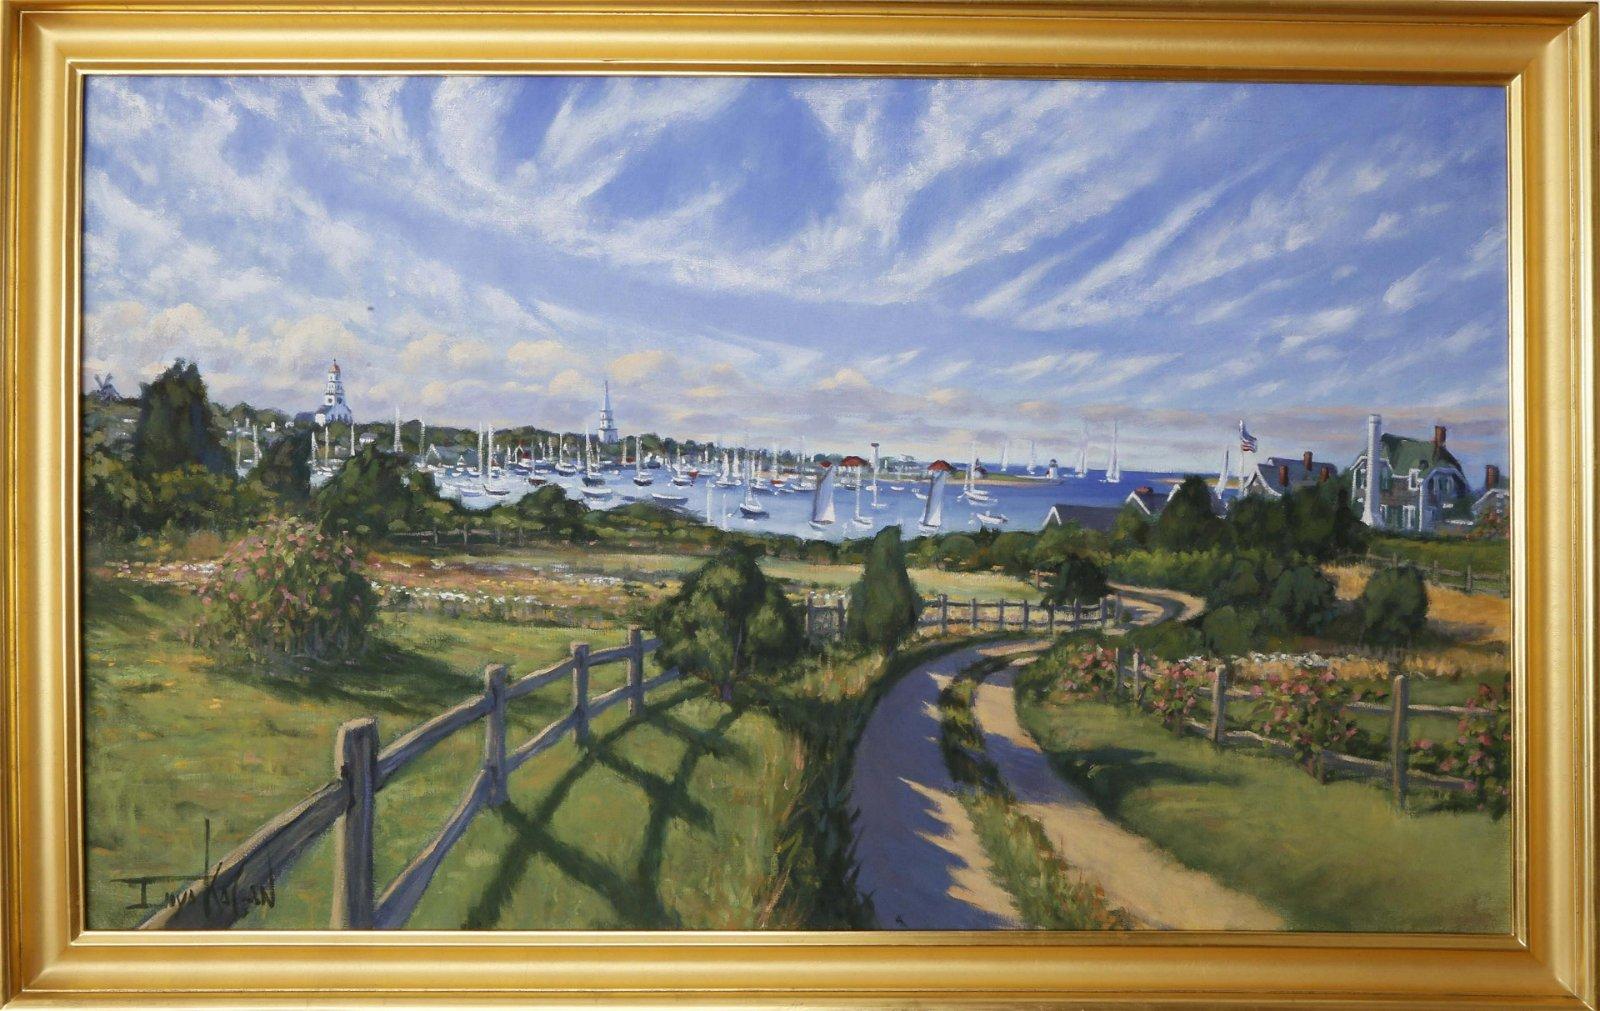 Illya Kagan - View of the Town of Nantucket